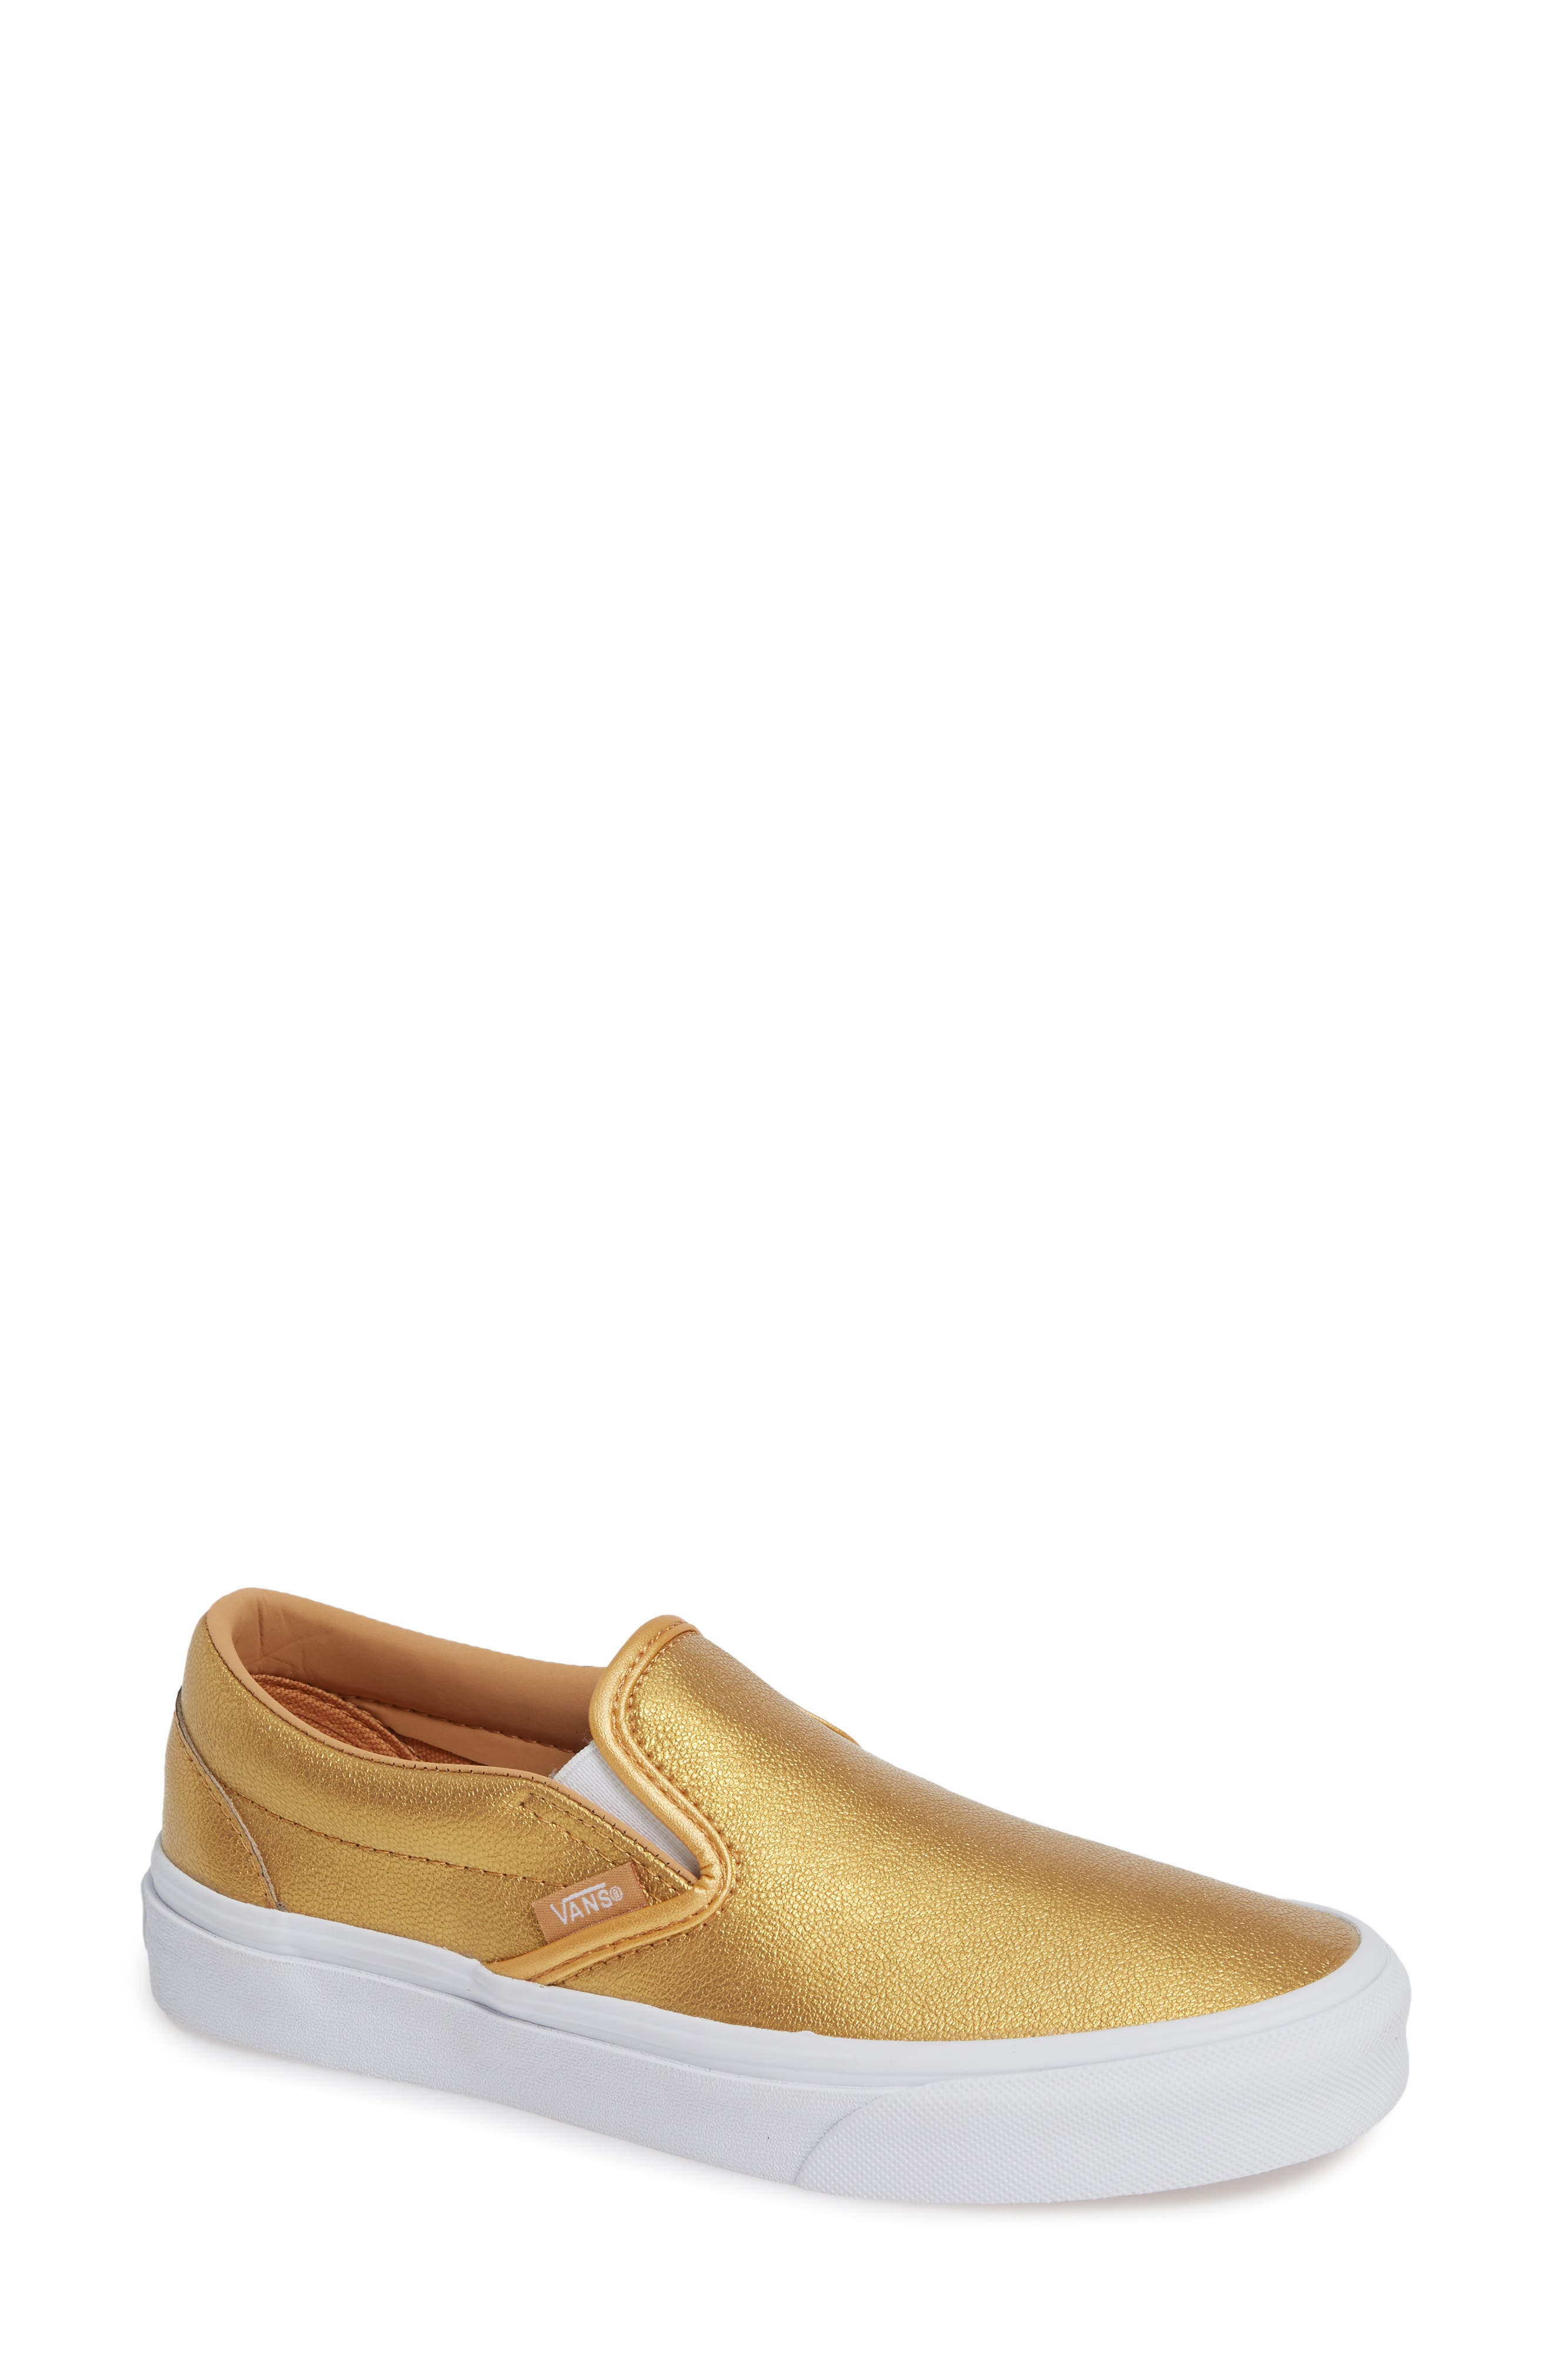 ,                             Classic Slip-On Sneaker,                             Main thumbnail 65, color,                             712